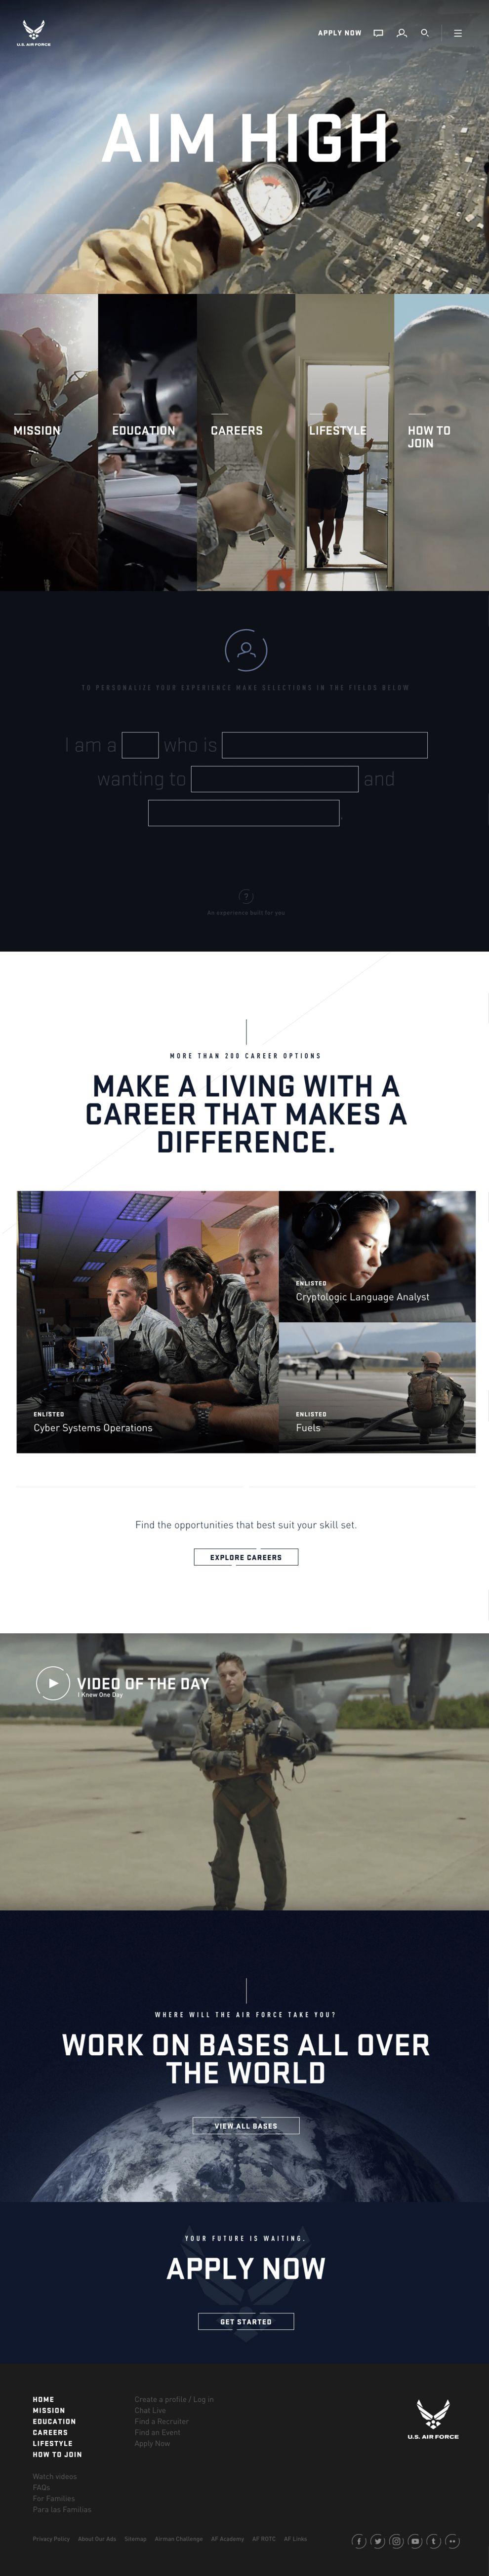 Air Force Beautiful Homepage